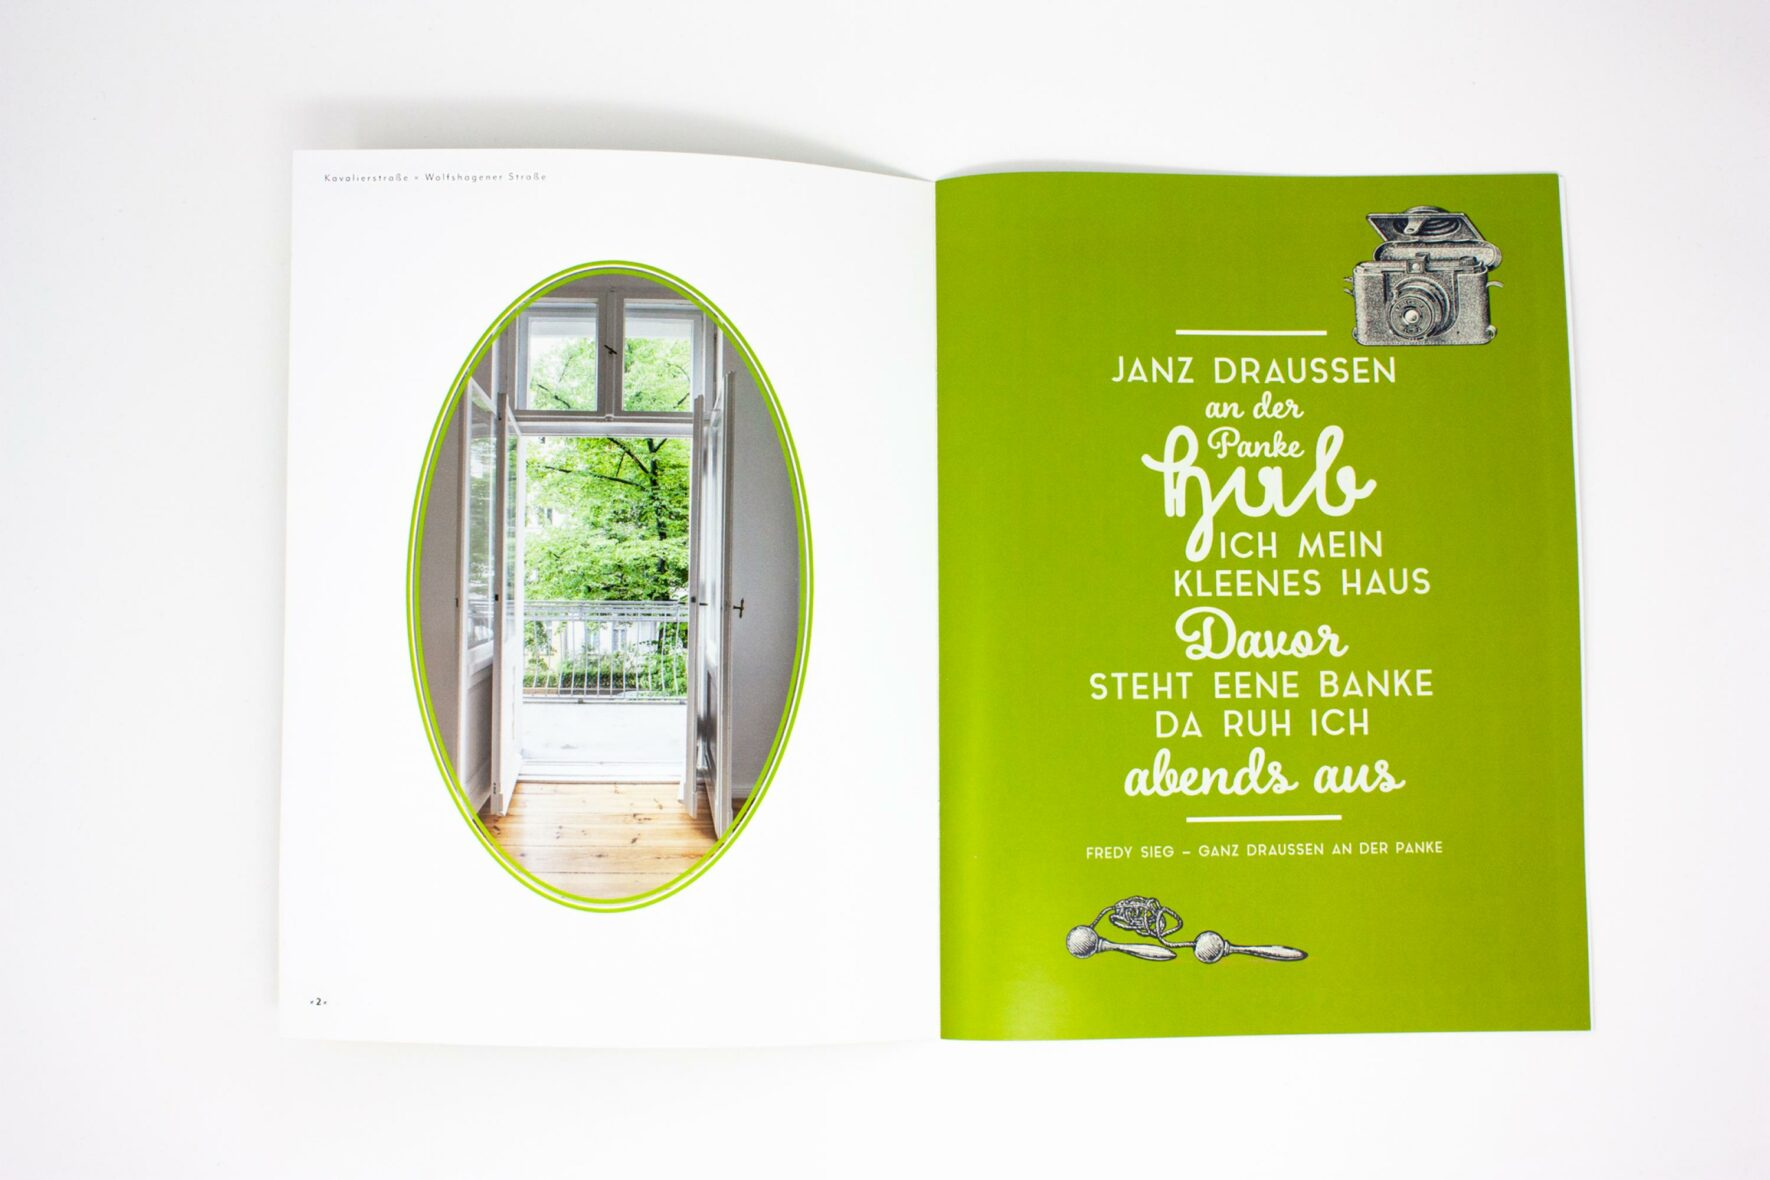 FORMLOS-Trendcity-Immobilien-Corporate-Design-Layout-Broschüre-7